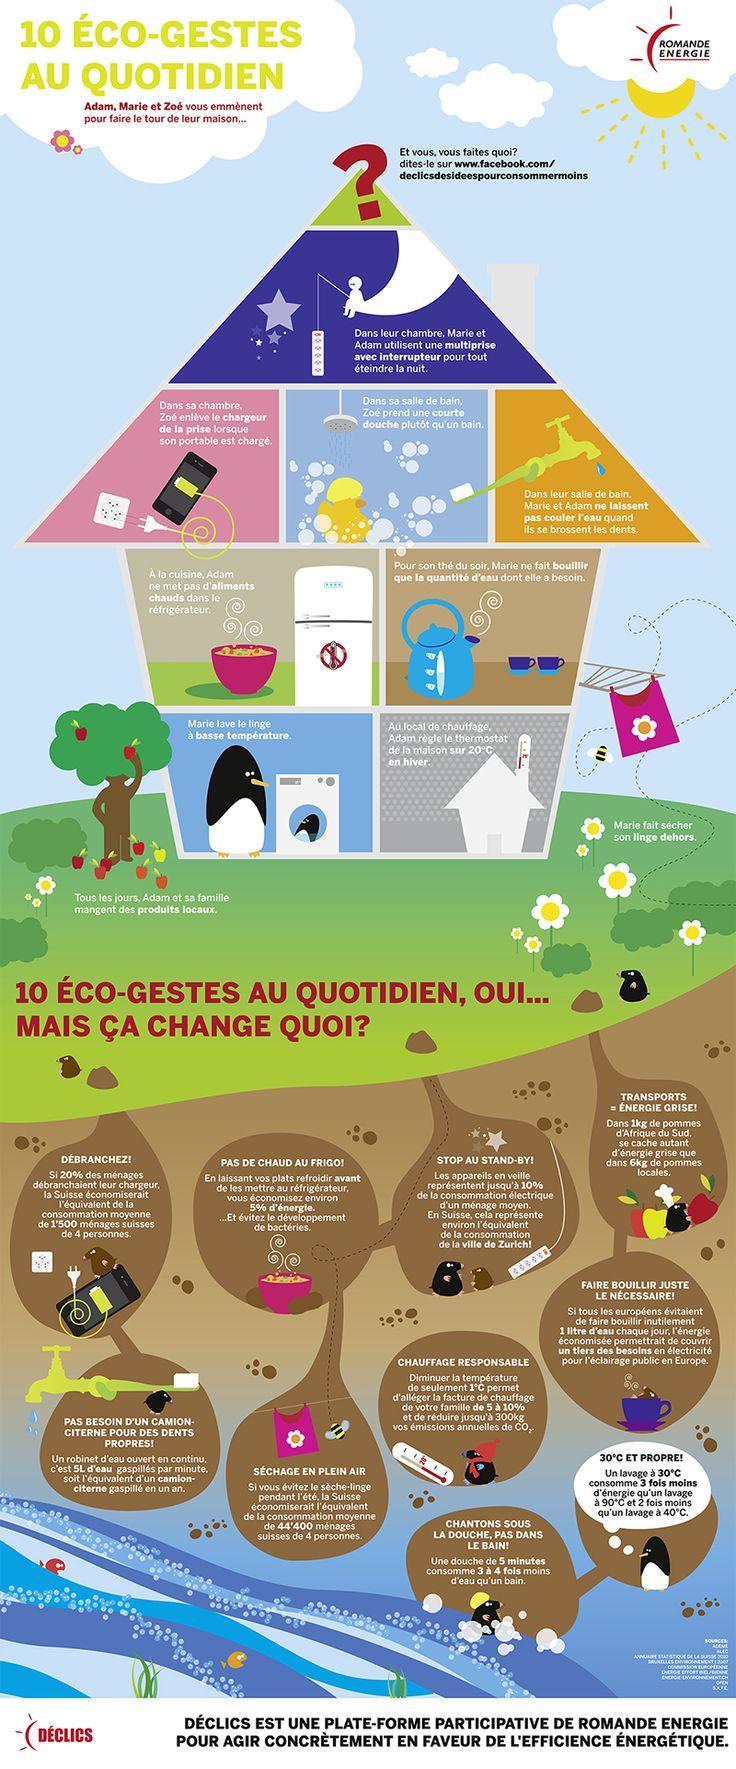 http://declics.romande-energie.ch/articles/10-eco-gestes-au-quotidienUn…